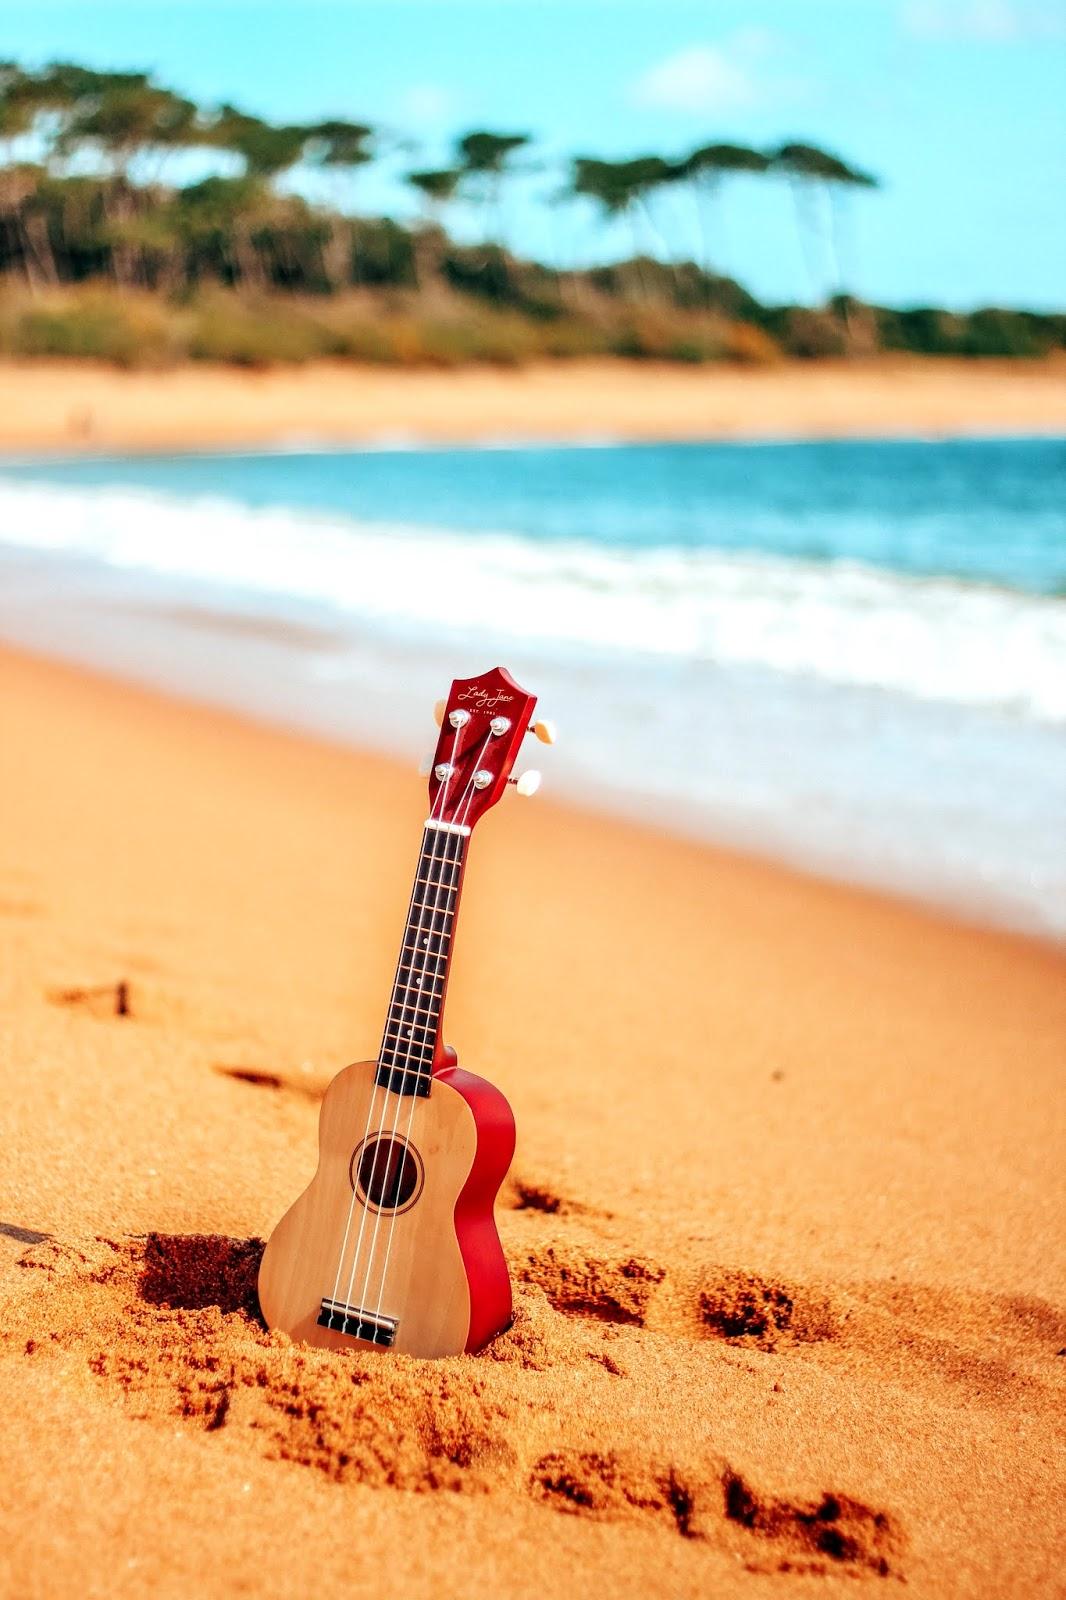 playa honda punta del este